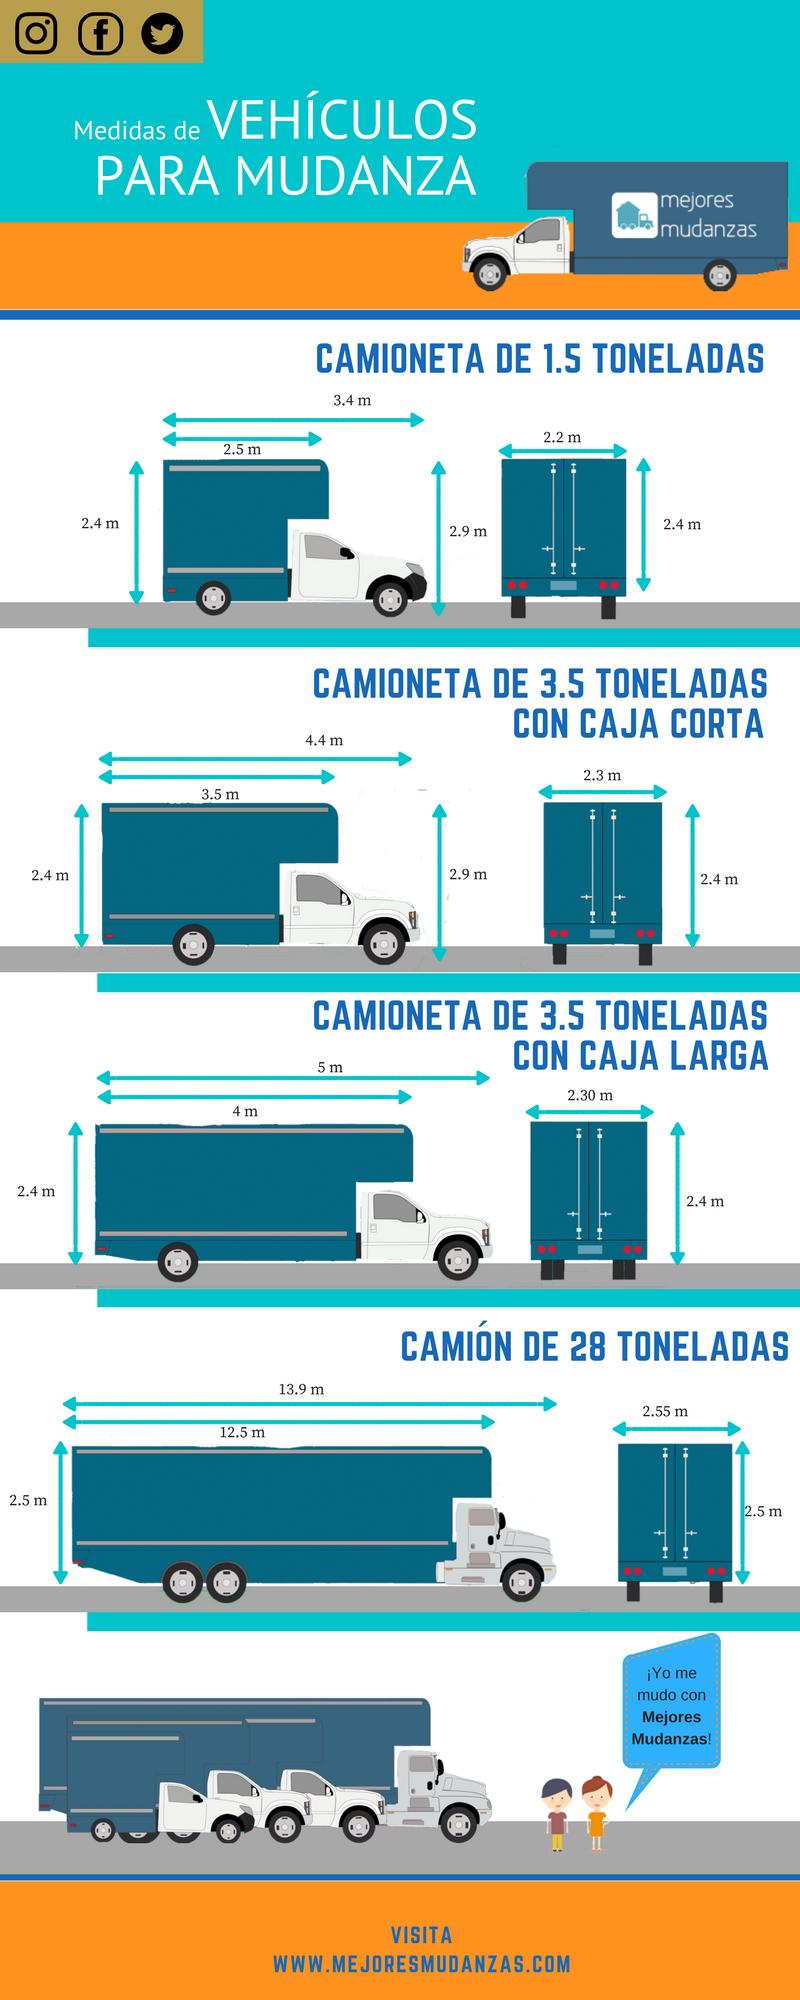 camion de mudanza